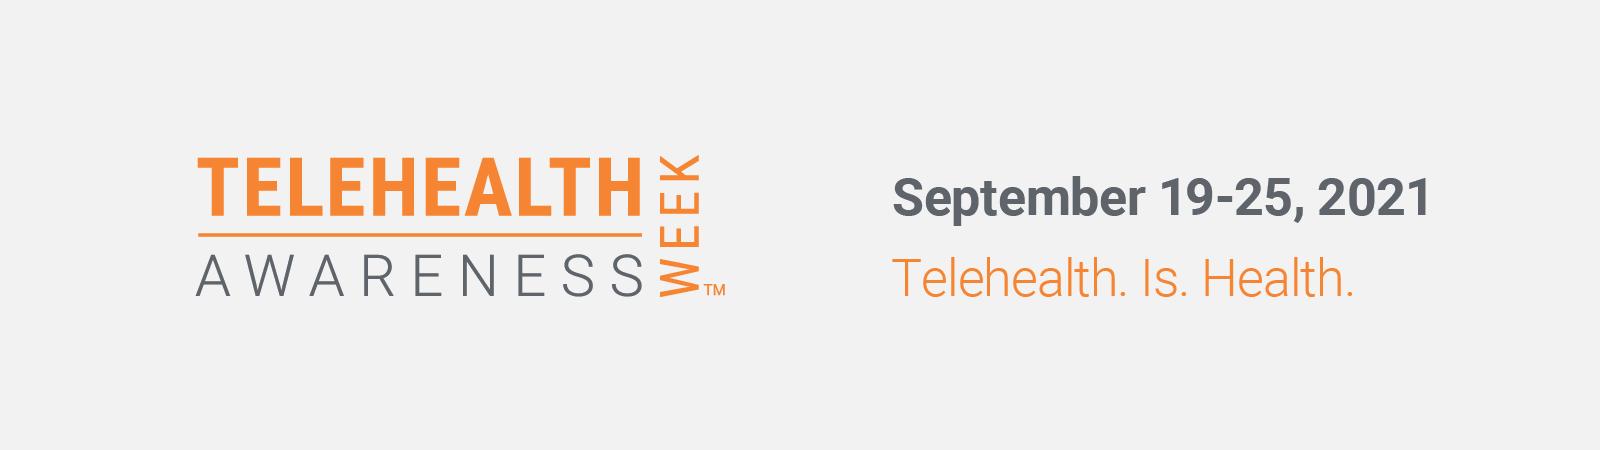 Telehealth Awareness Week 2